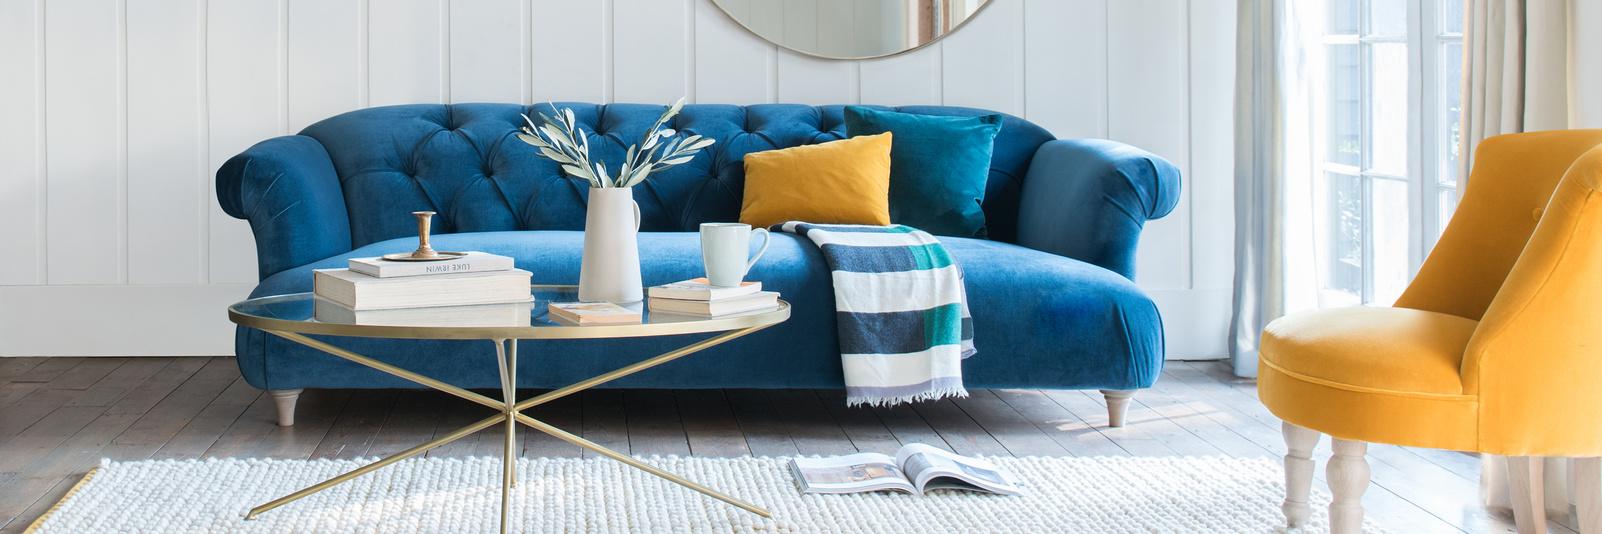 Velvet Sofas | Choose Your Colour, Style U0026 Size | Loaf